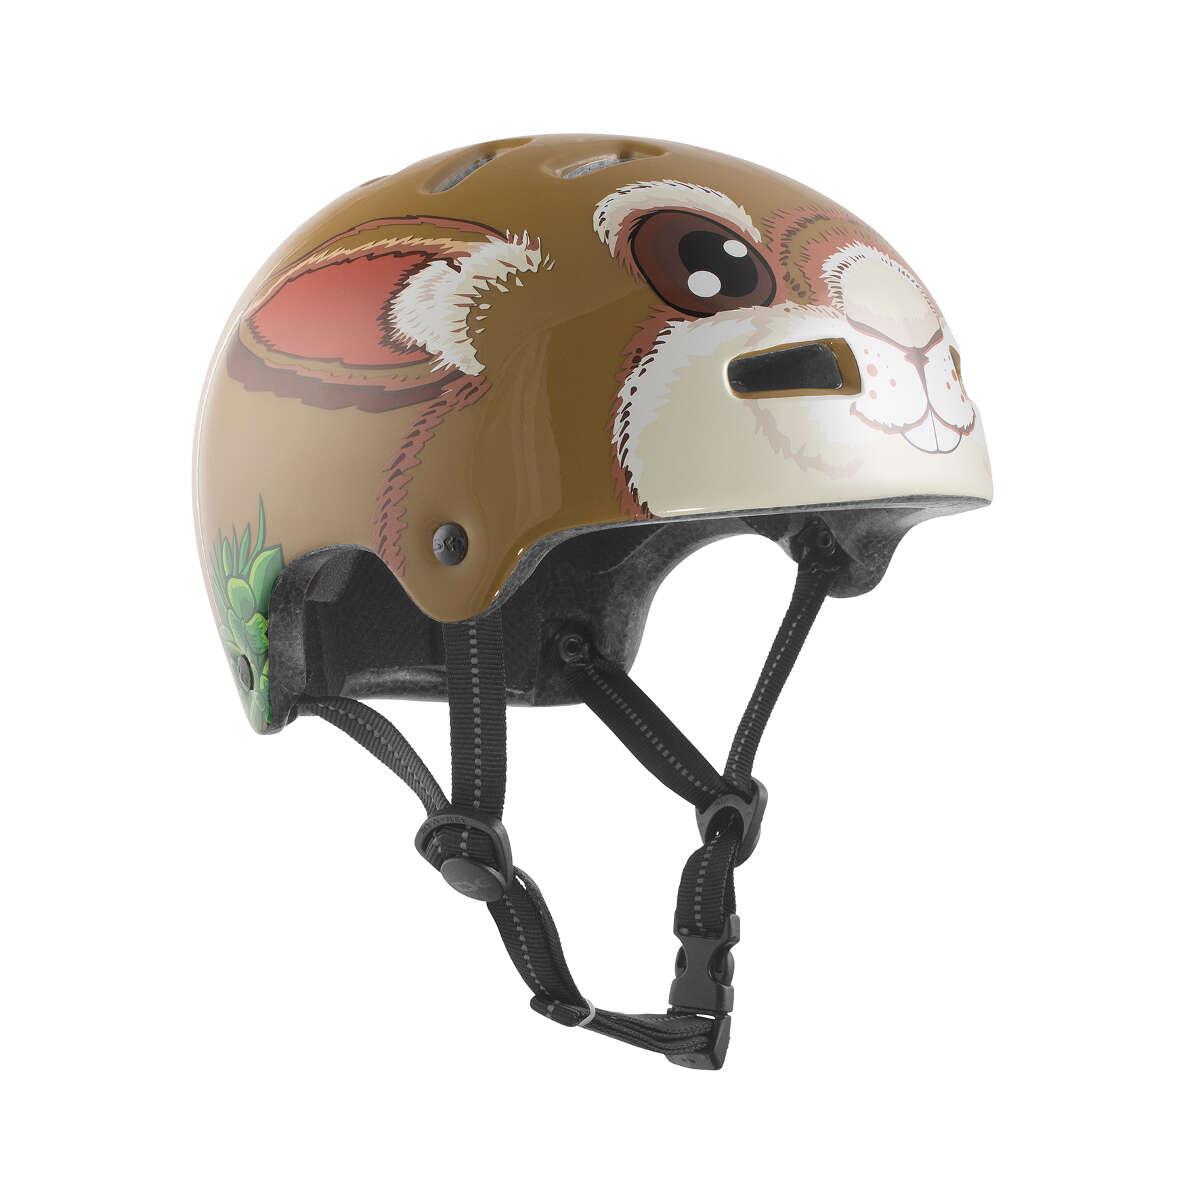 TSG Kids BMX/Dirt Helm Nipper Mini Graphic Design - Bunny